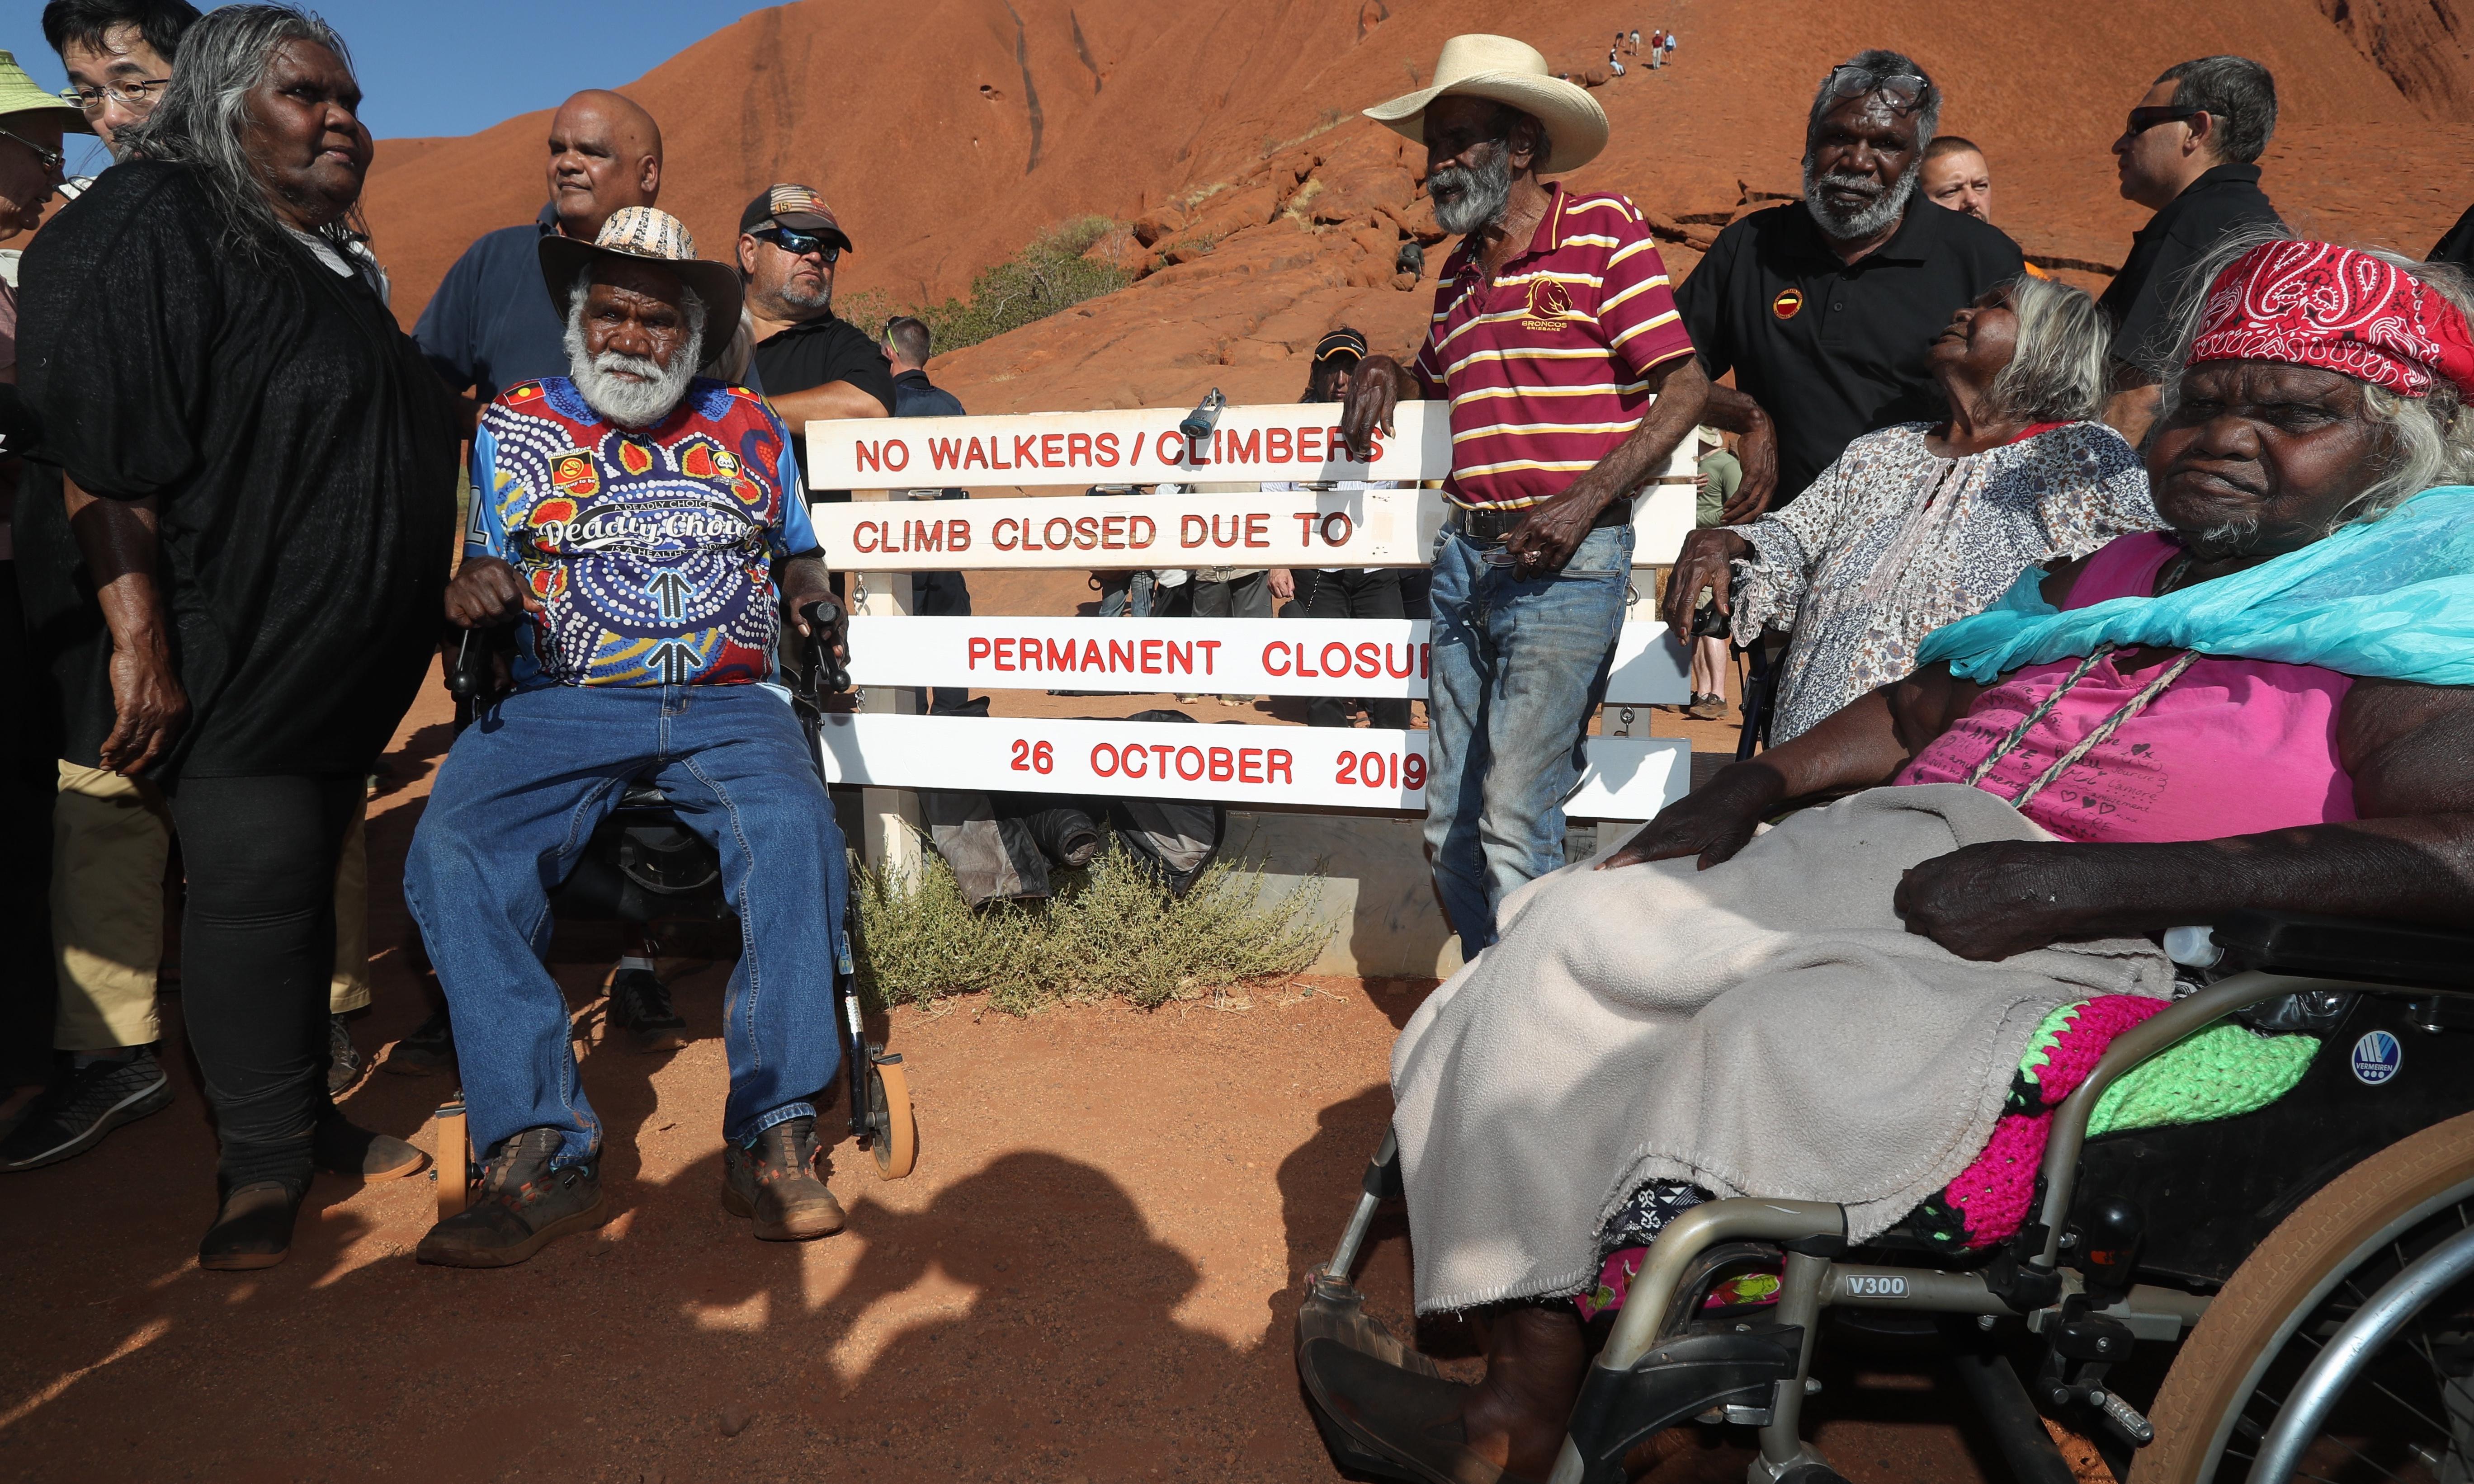 'Respect is given': Australia closes climb on sacred Uluru